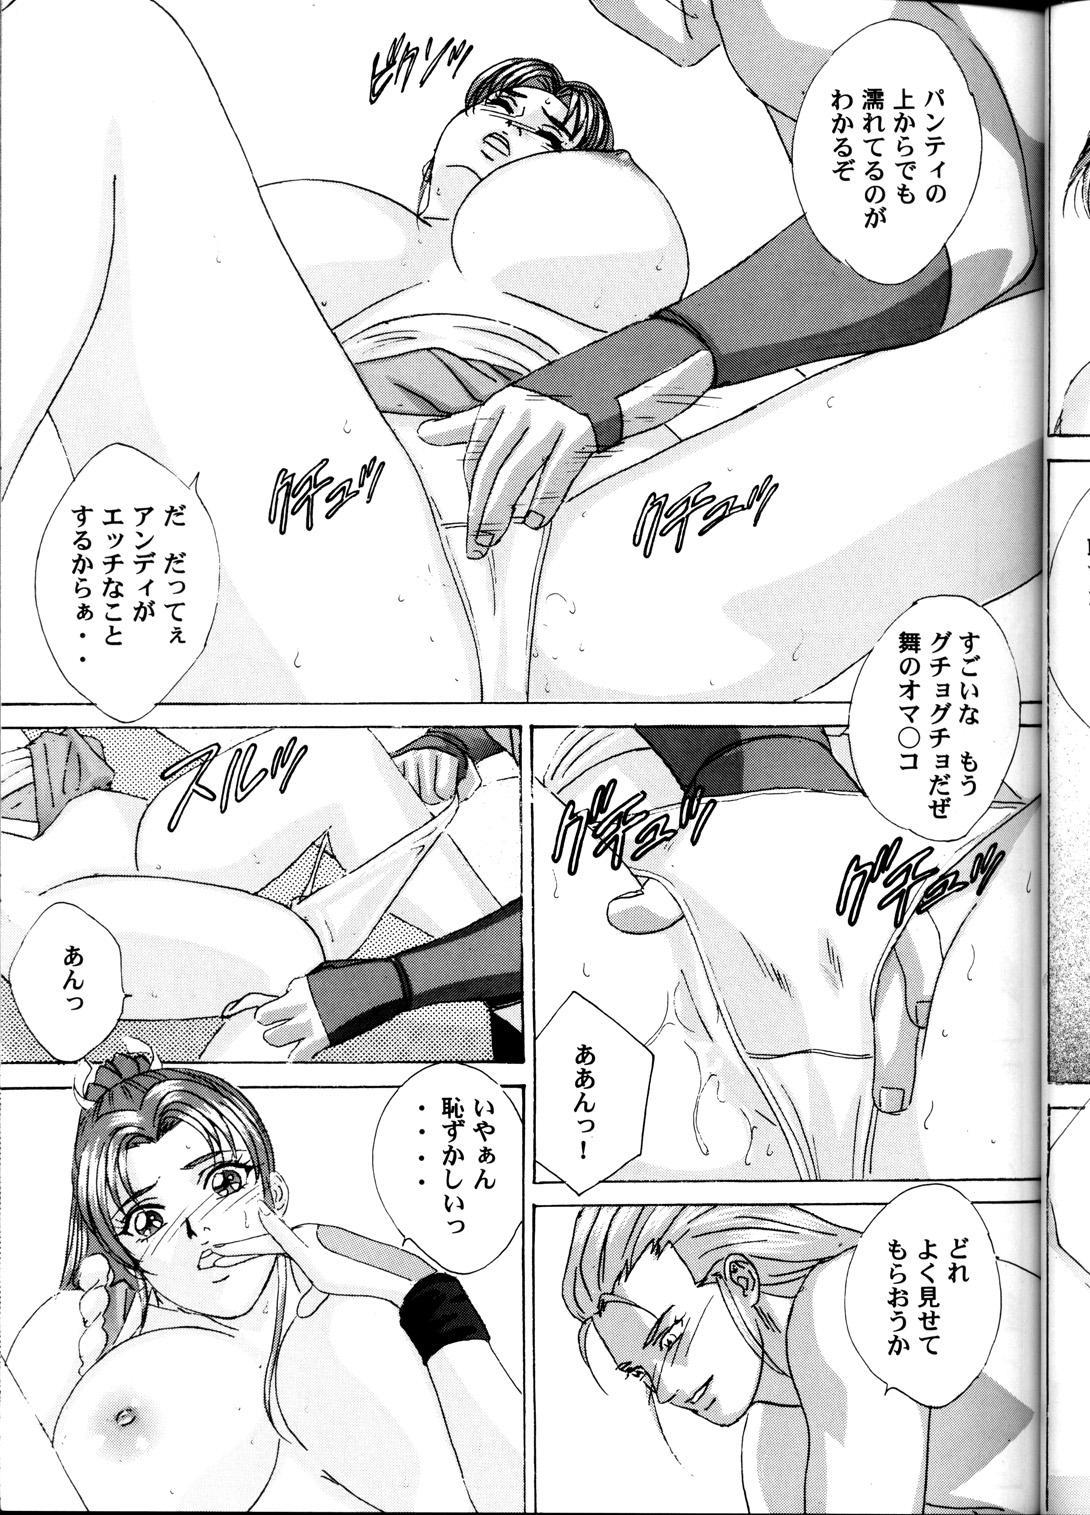 (C60) [D-LOVERS (Nishimaki Tohru)] Mai -Innyuuden- Daiichigou (King of Fighters) 21